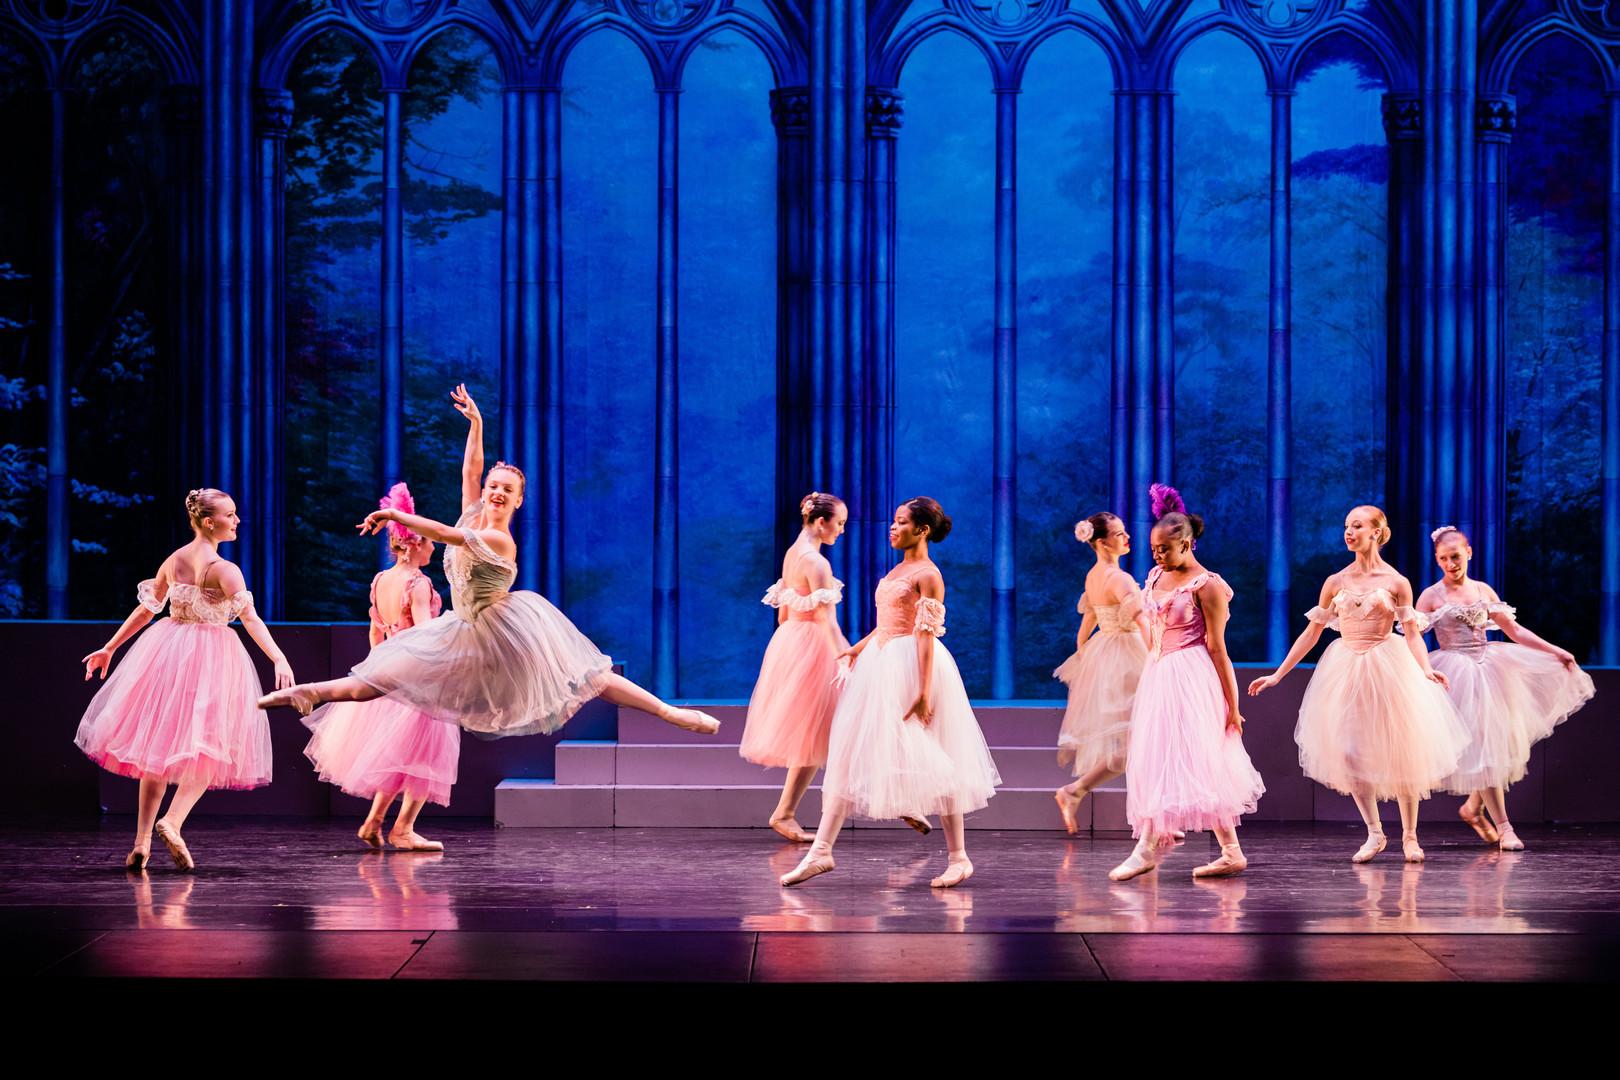 Waltzing Lady from Cinderella